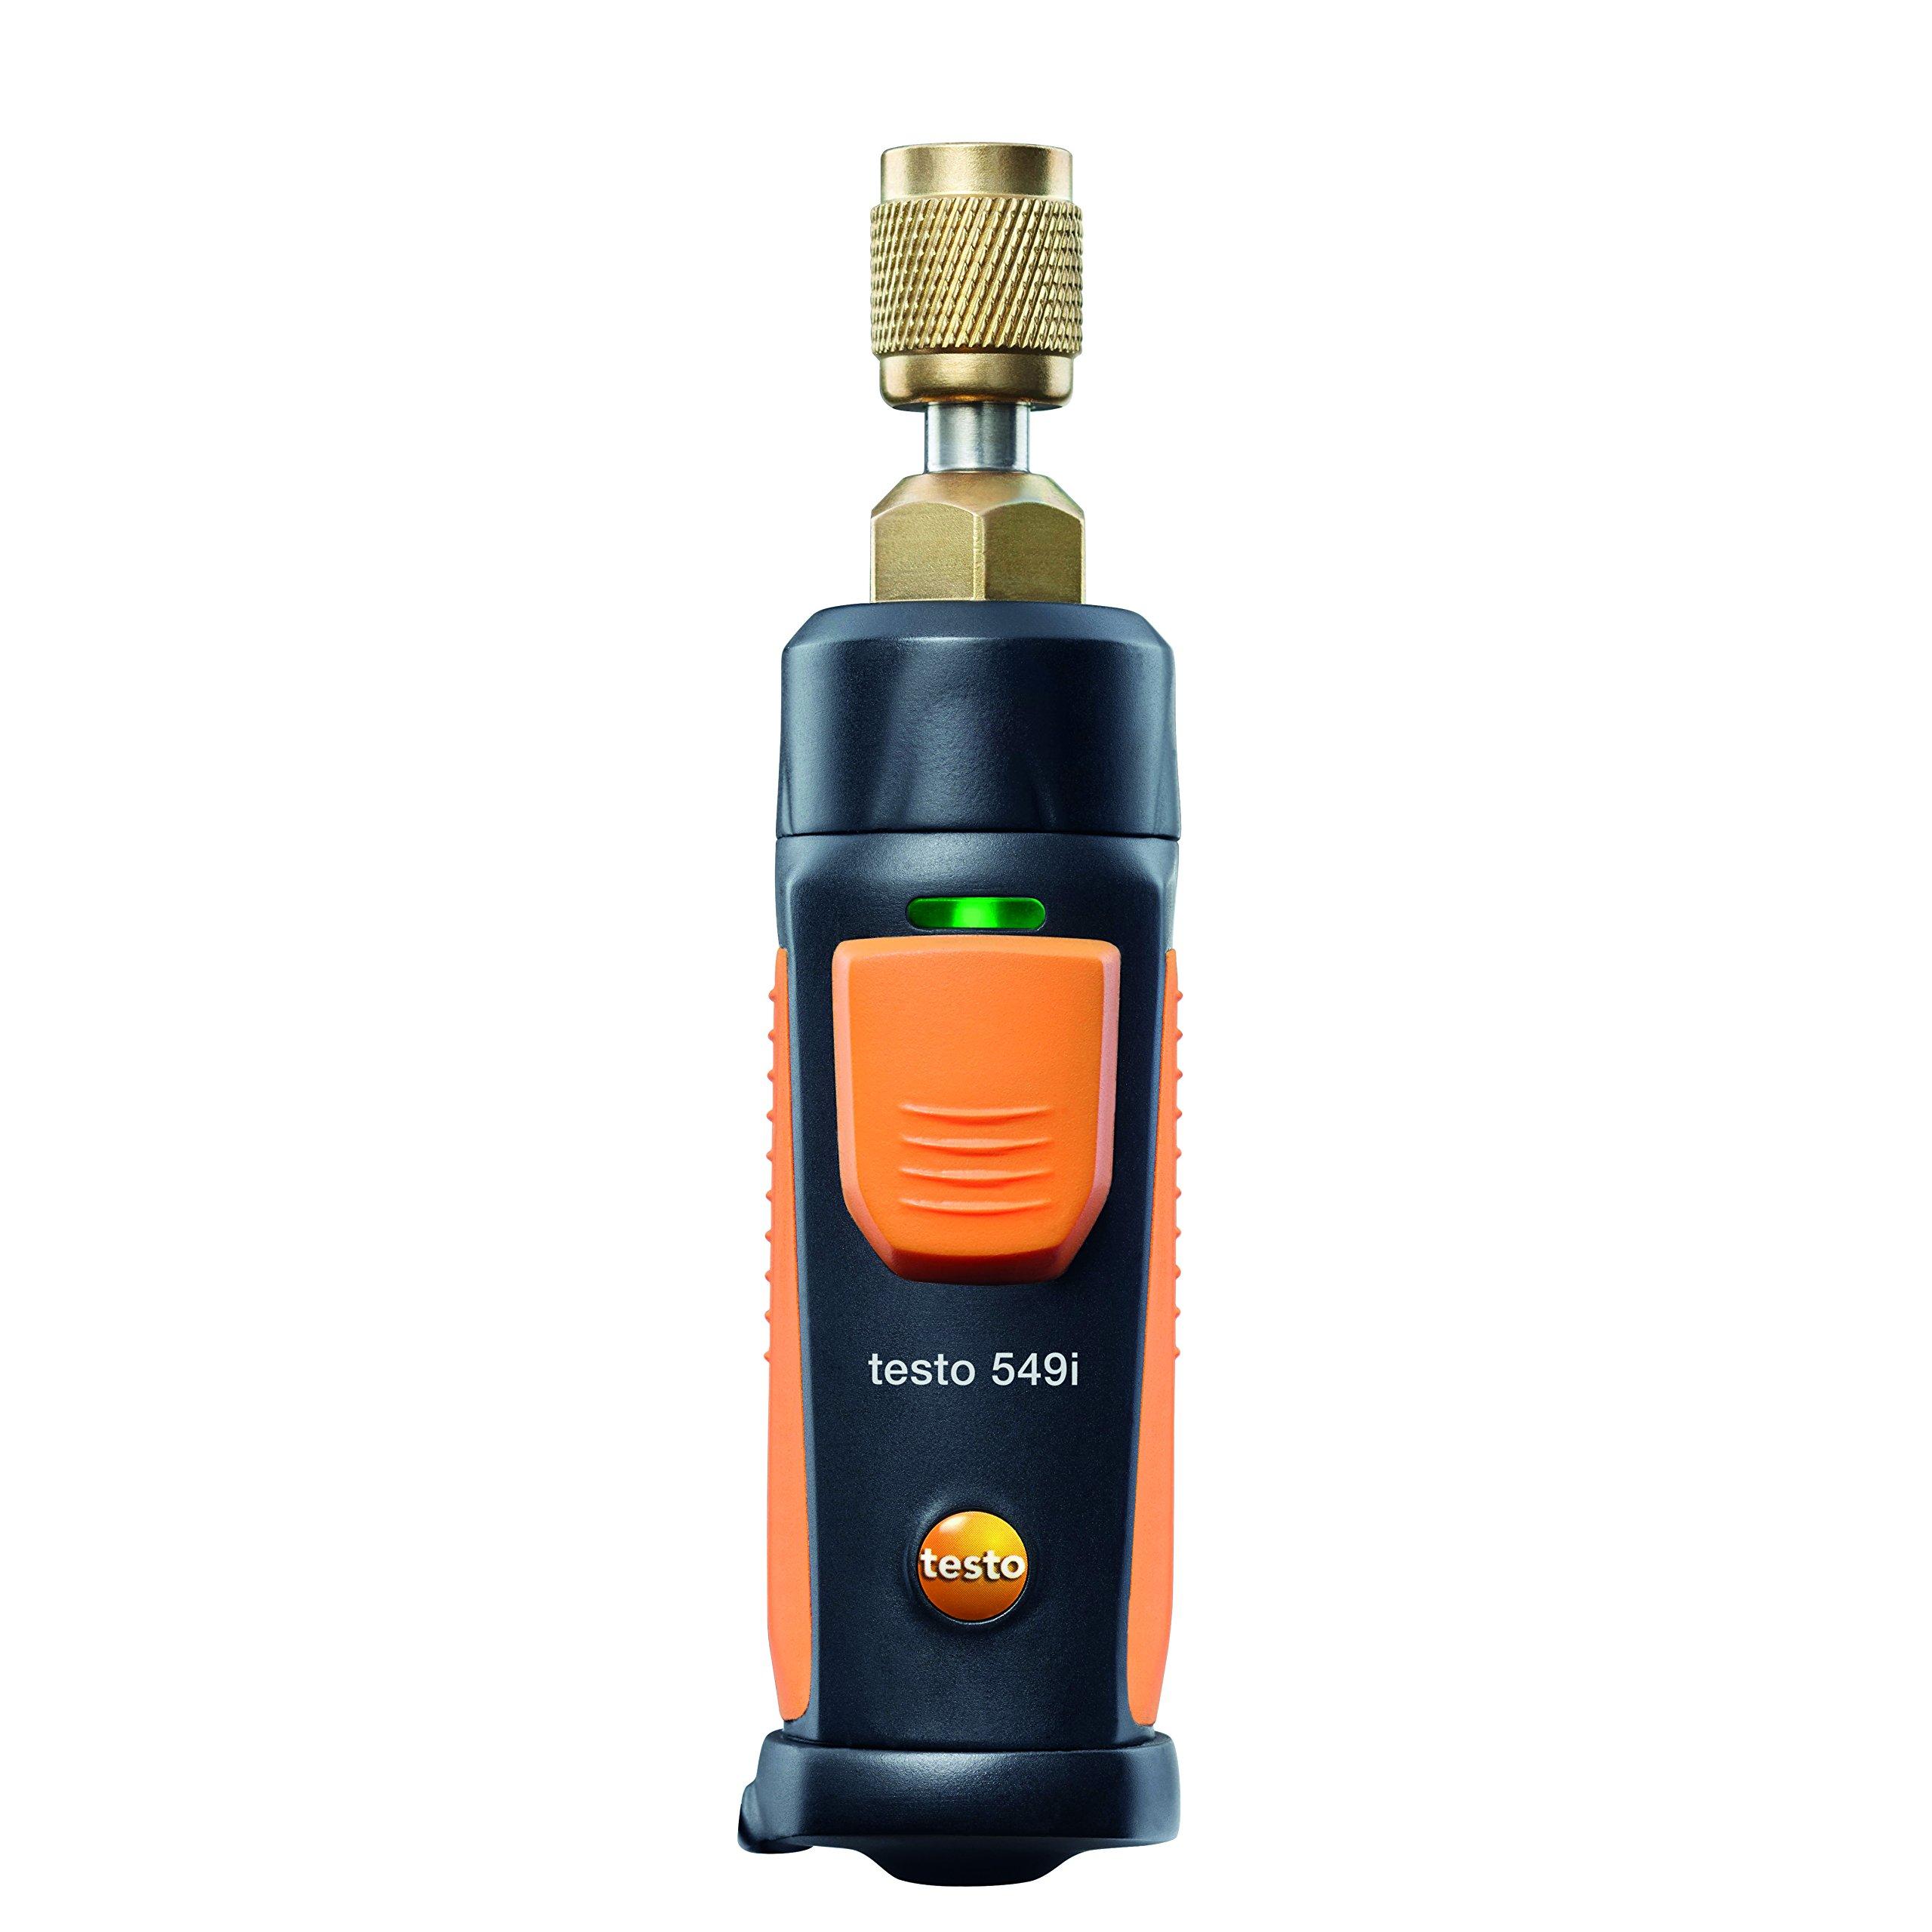 Testo 0563 0002 Refrigeration Wireless Smart Probe Set by Testo (Image #6)